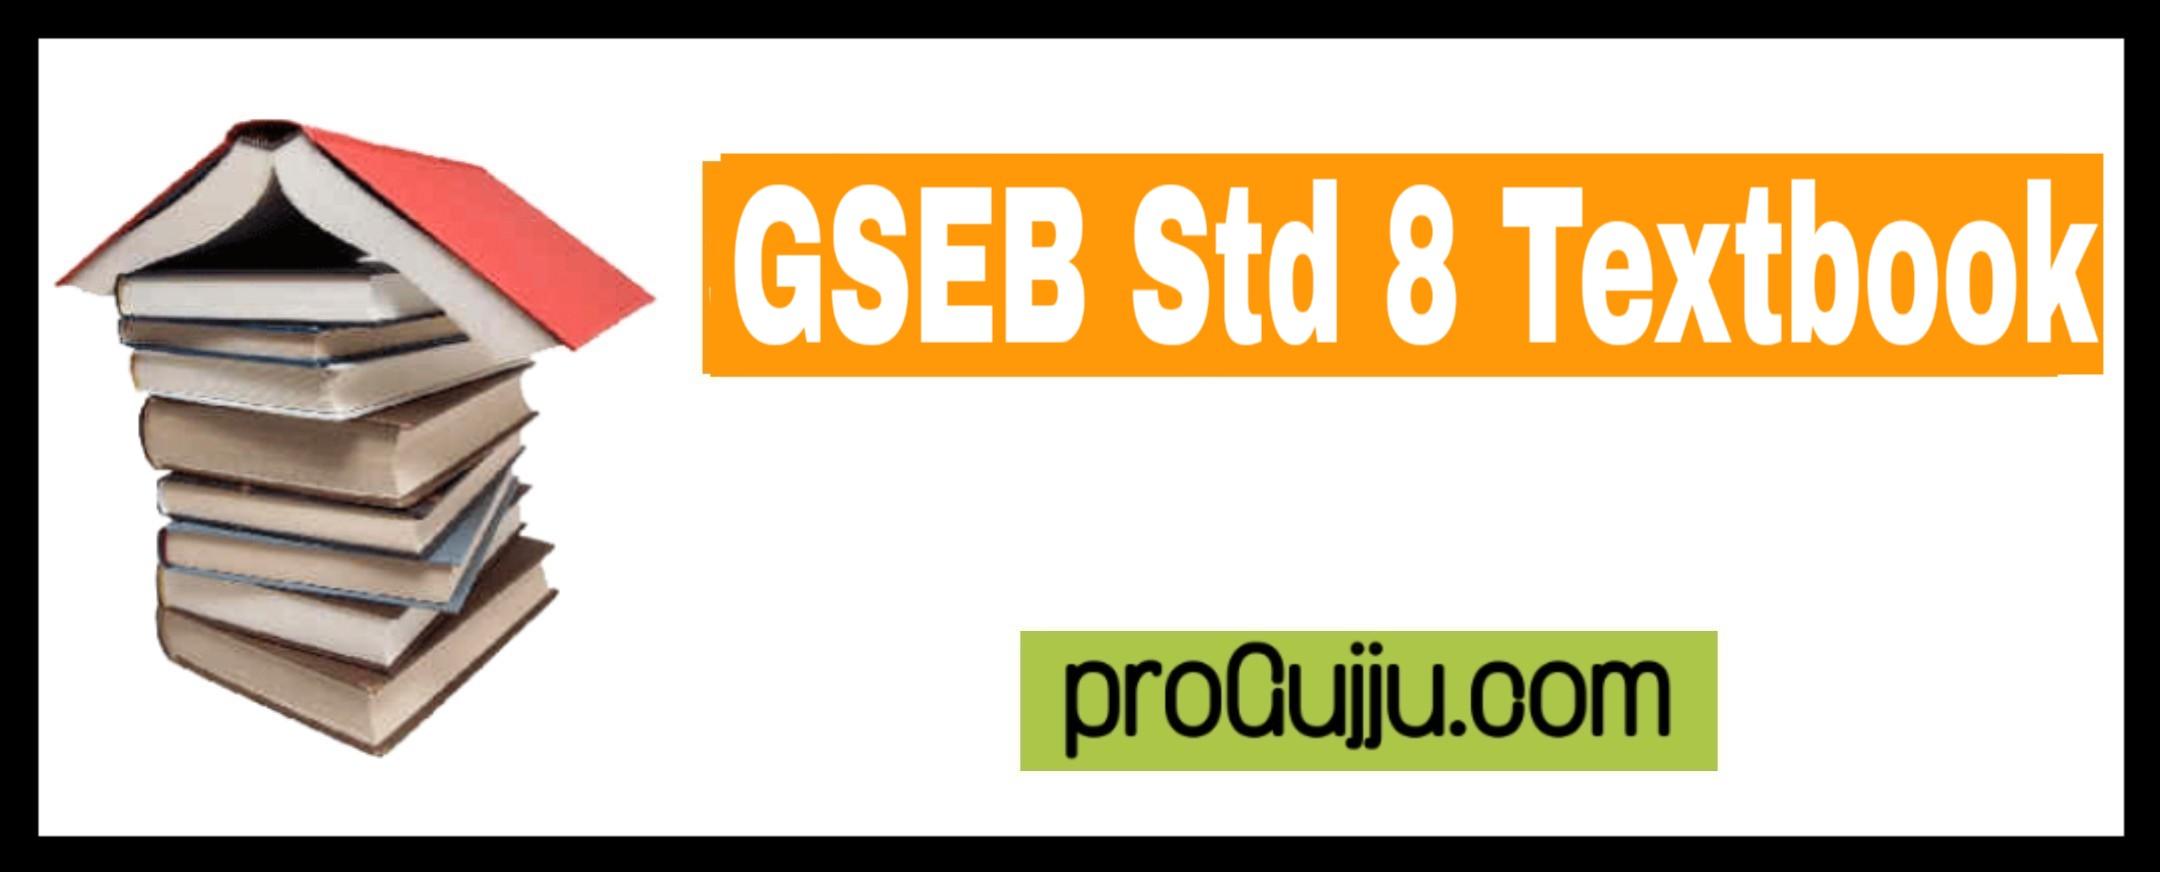 Gseb std 8 textbook